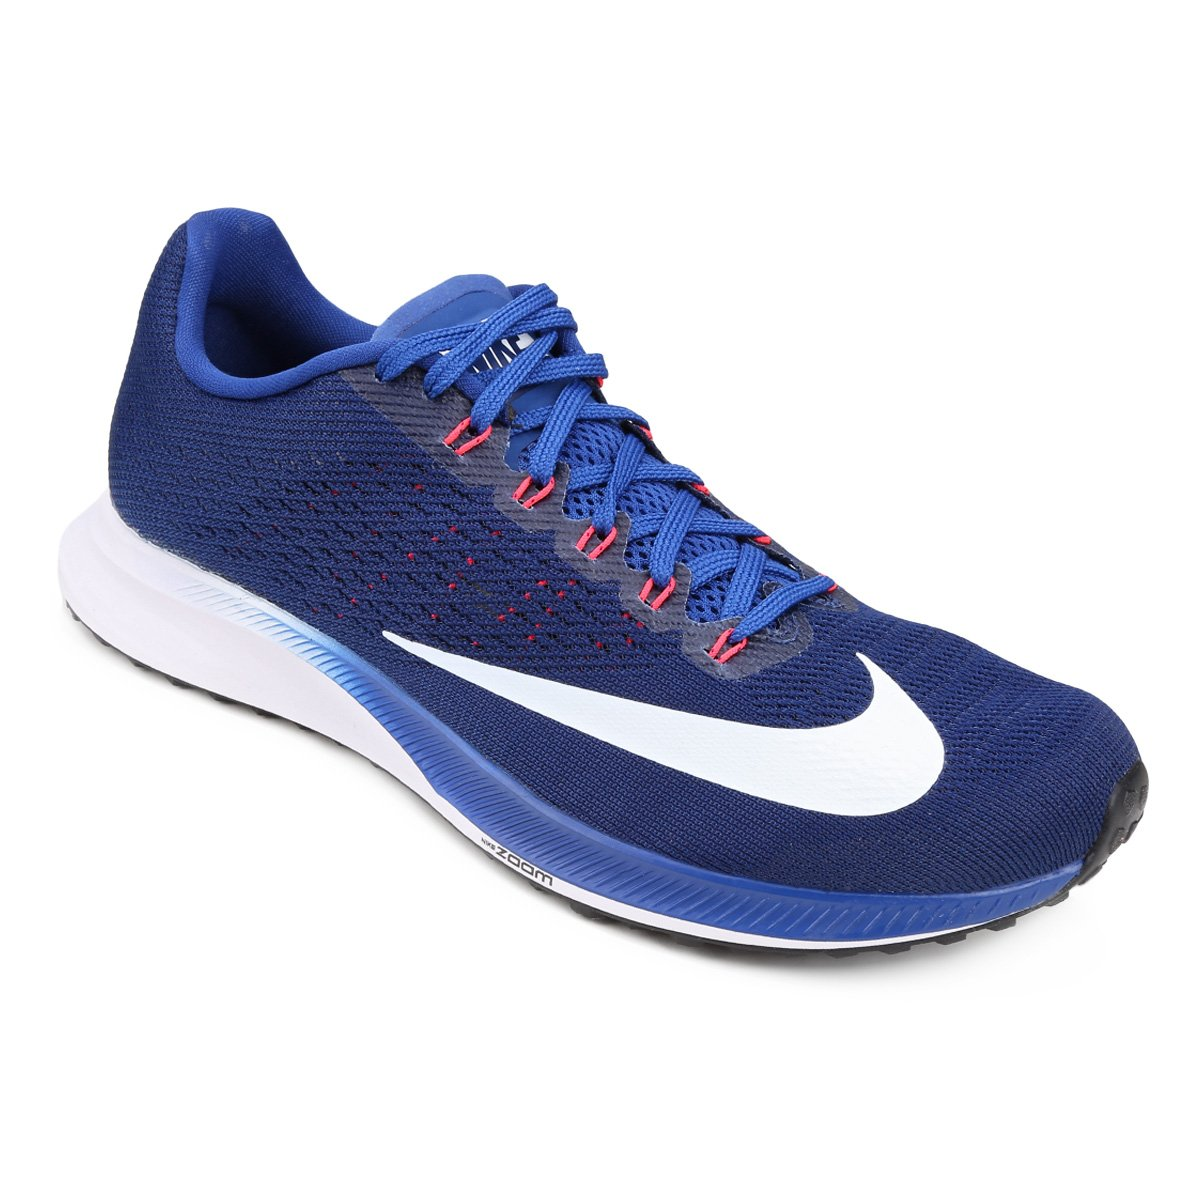 f247541d040 Tênis Nike Air Zoom Elite 10 Masculino - Azul - Compre Agora